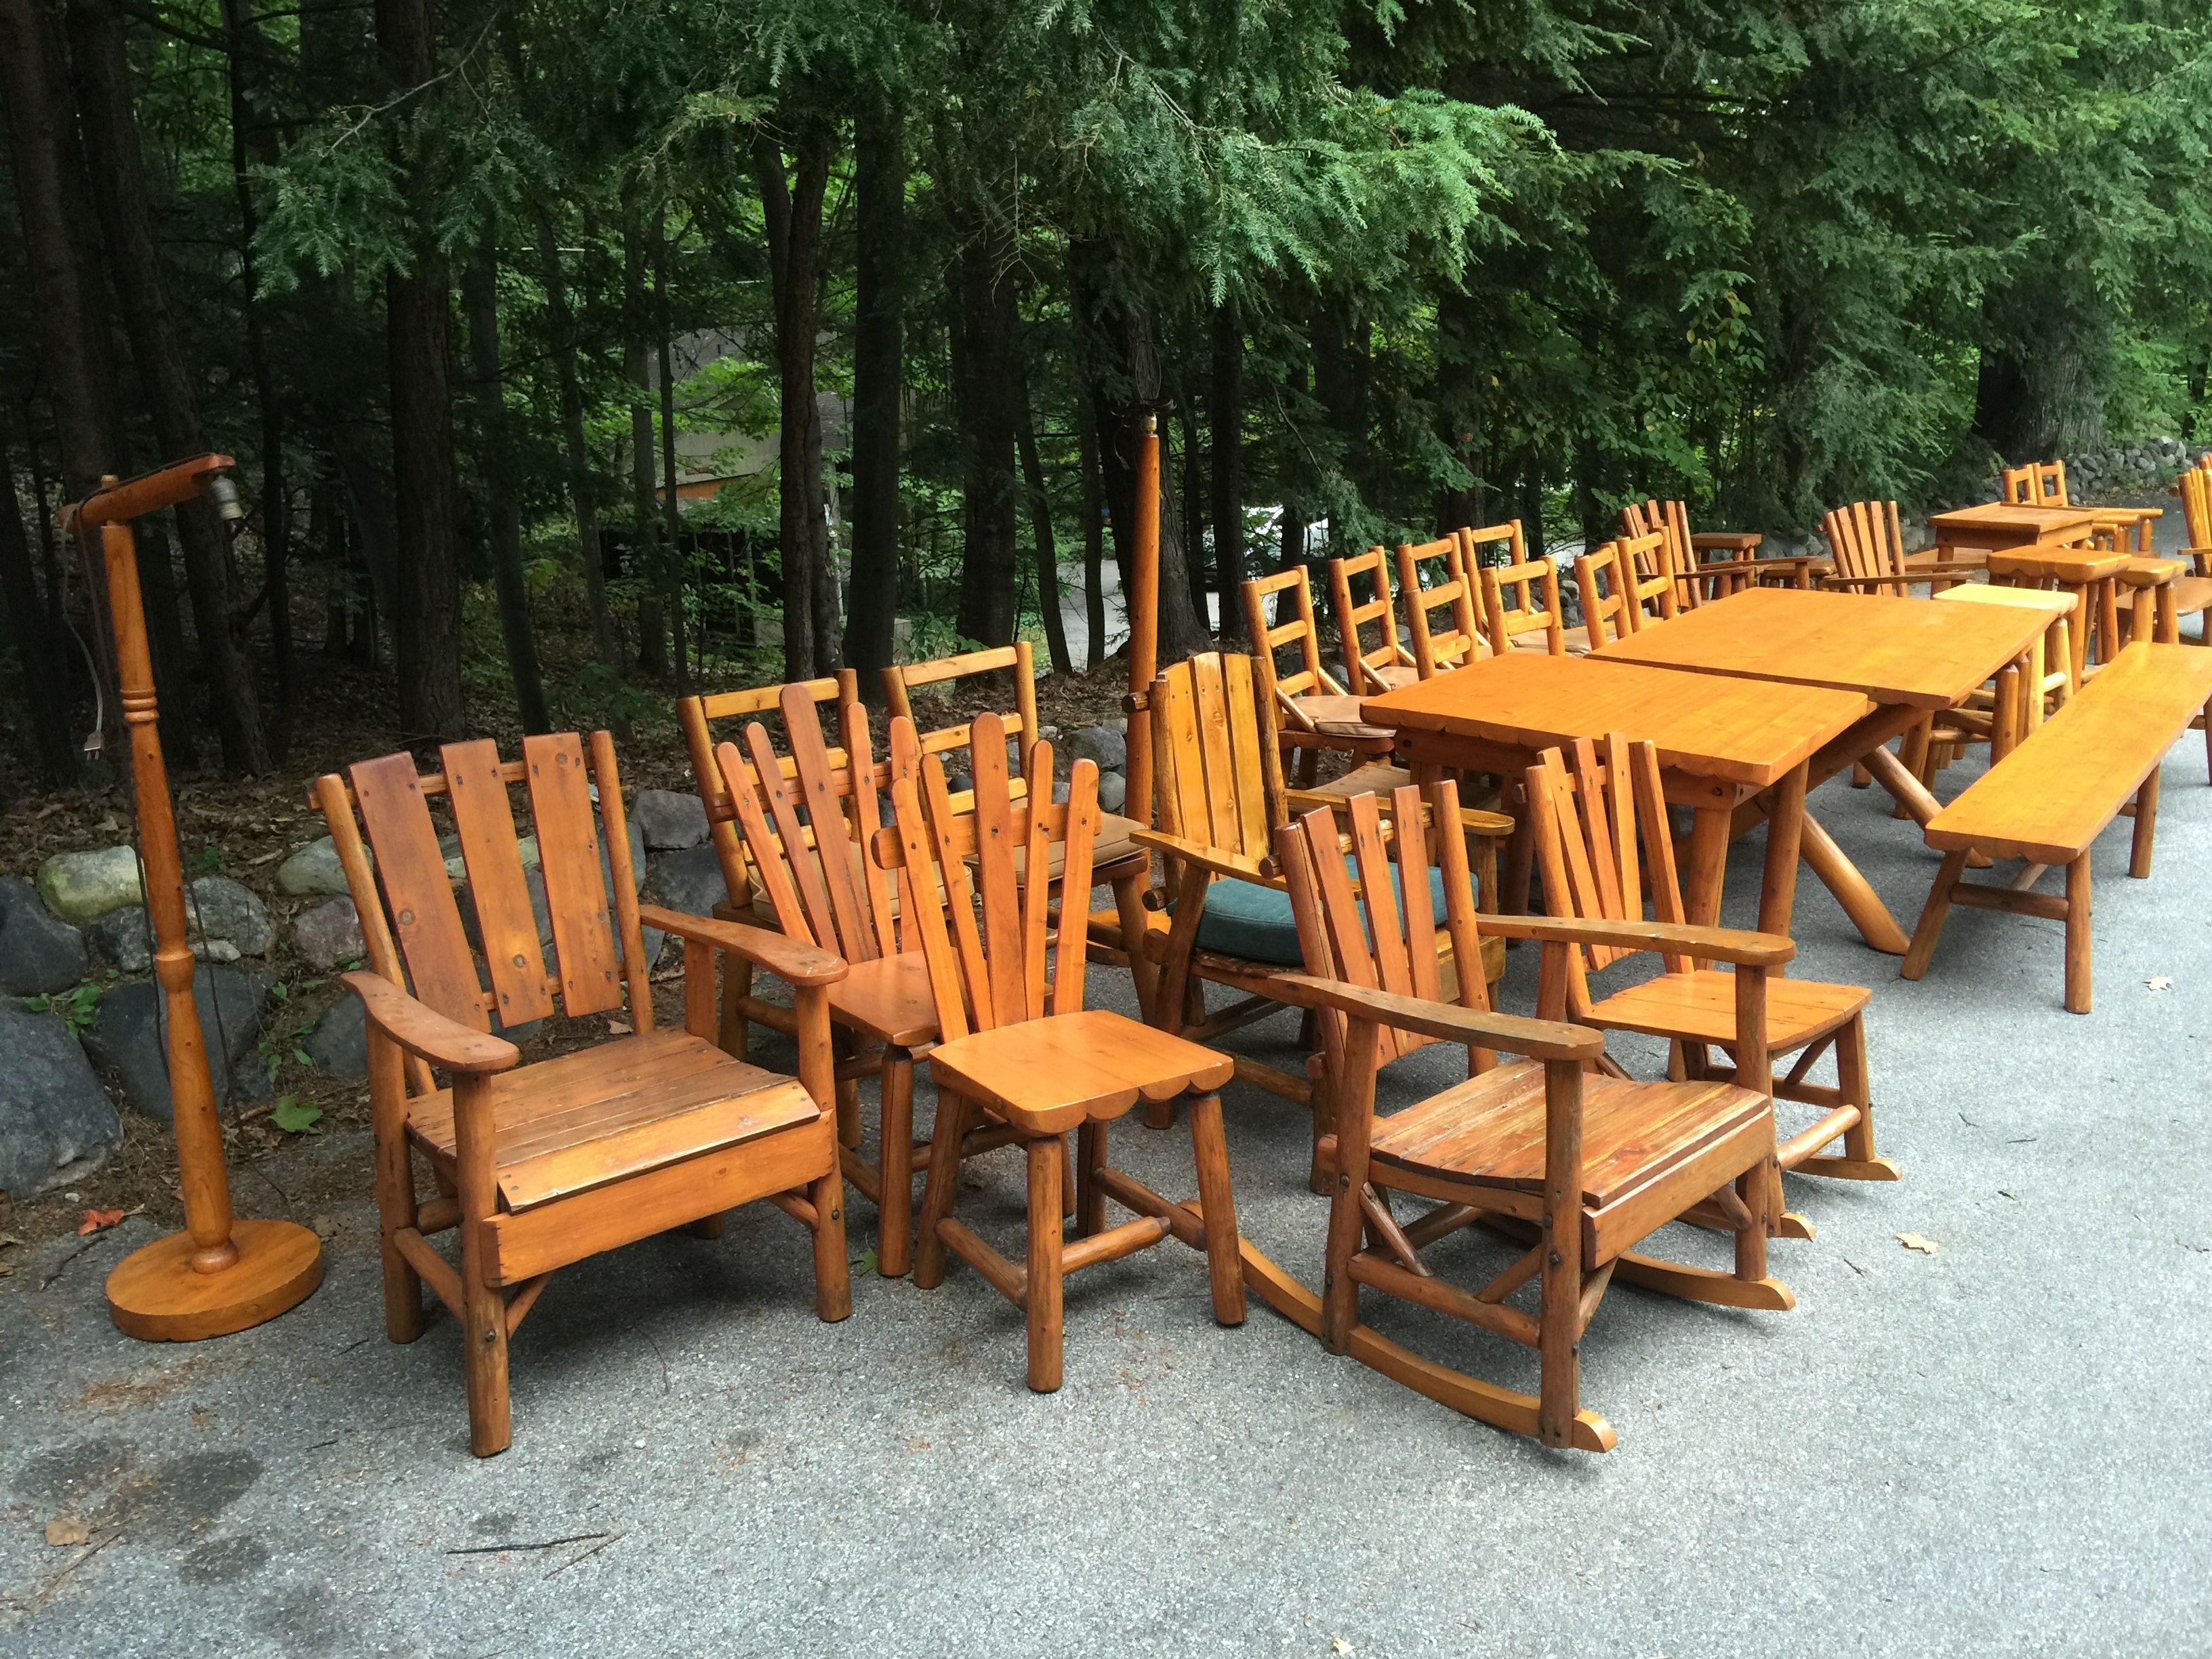 46 pcs of Rittenhouse log furniture from a northern Michigan